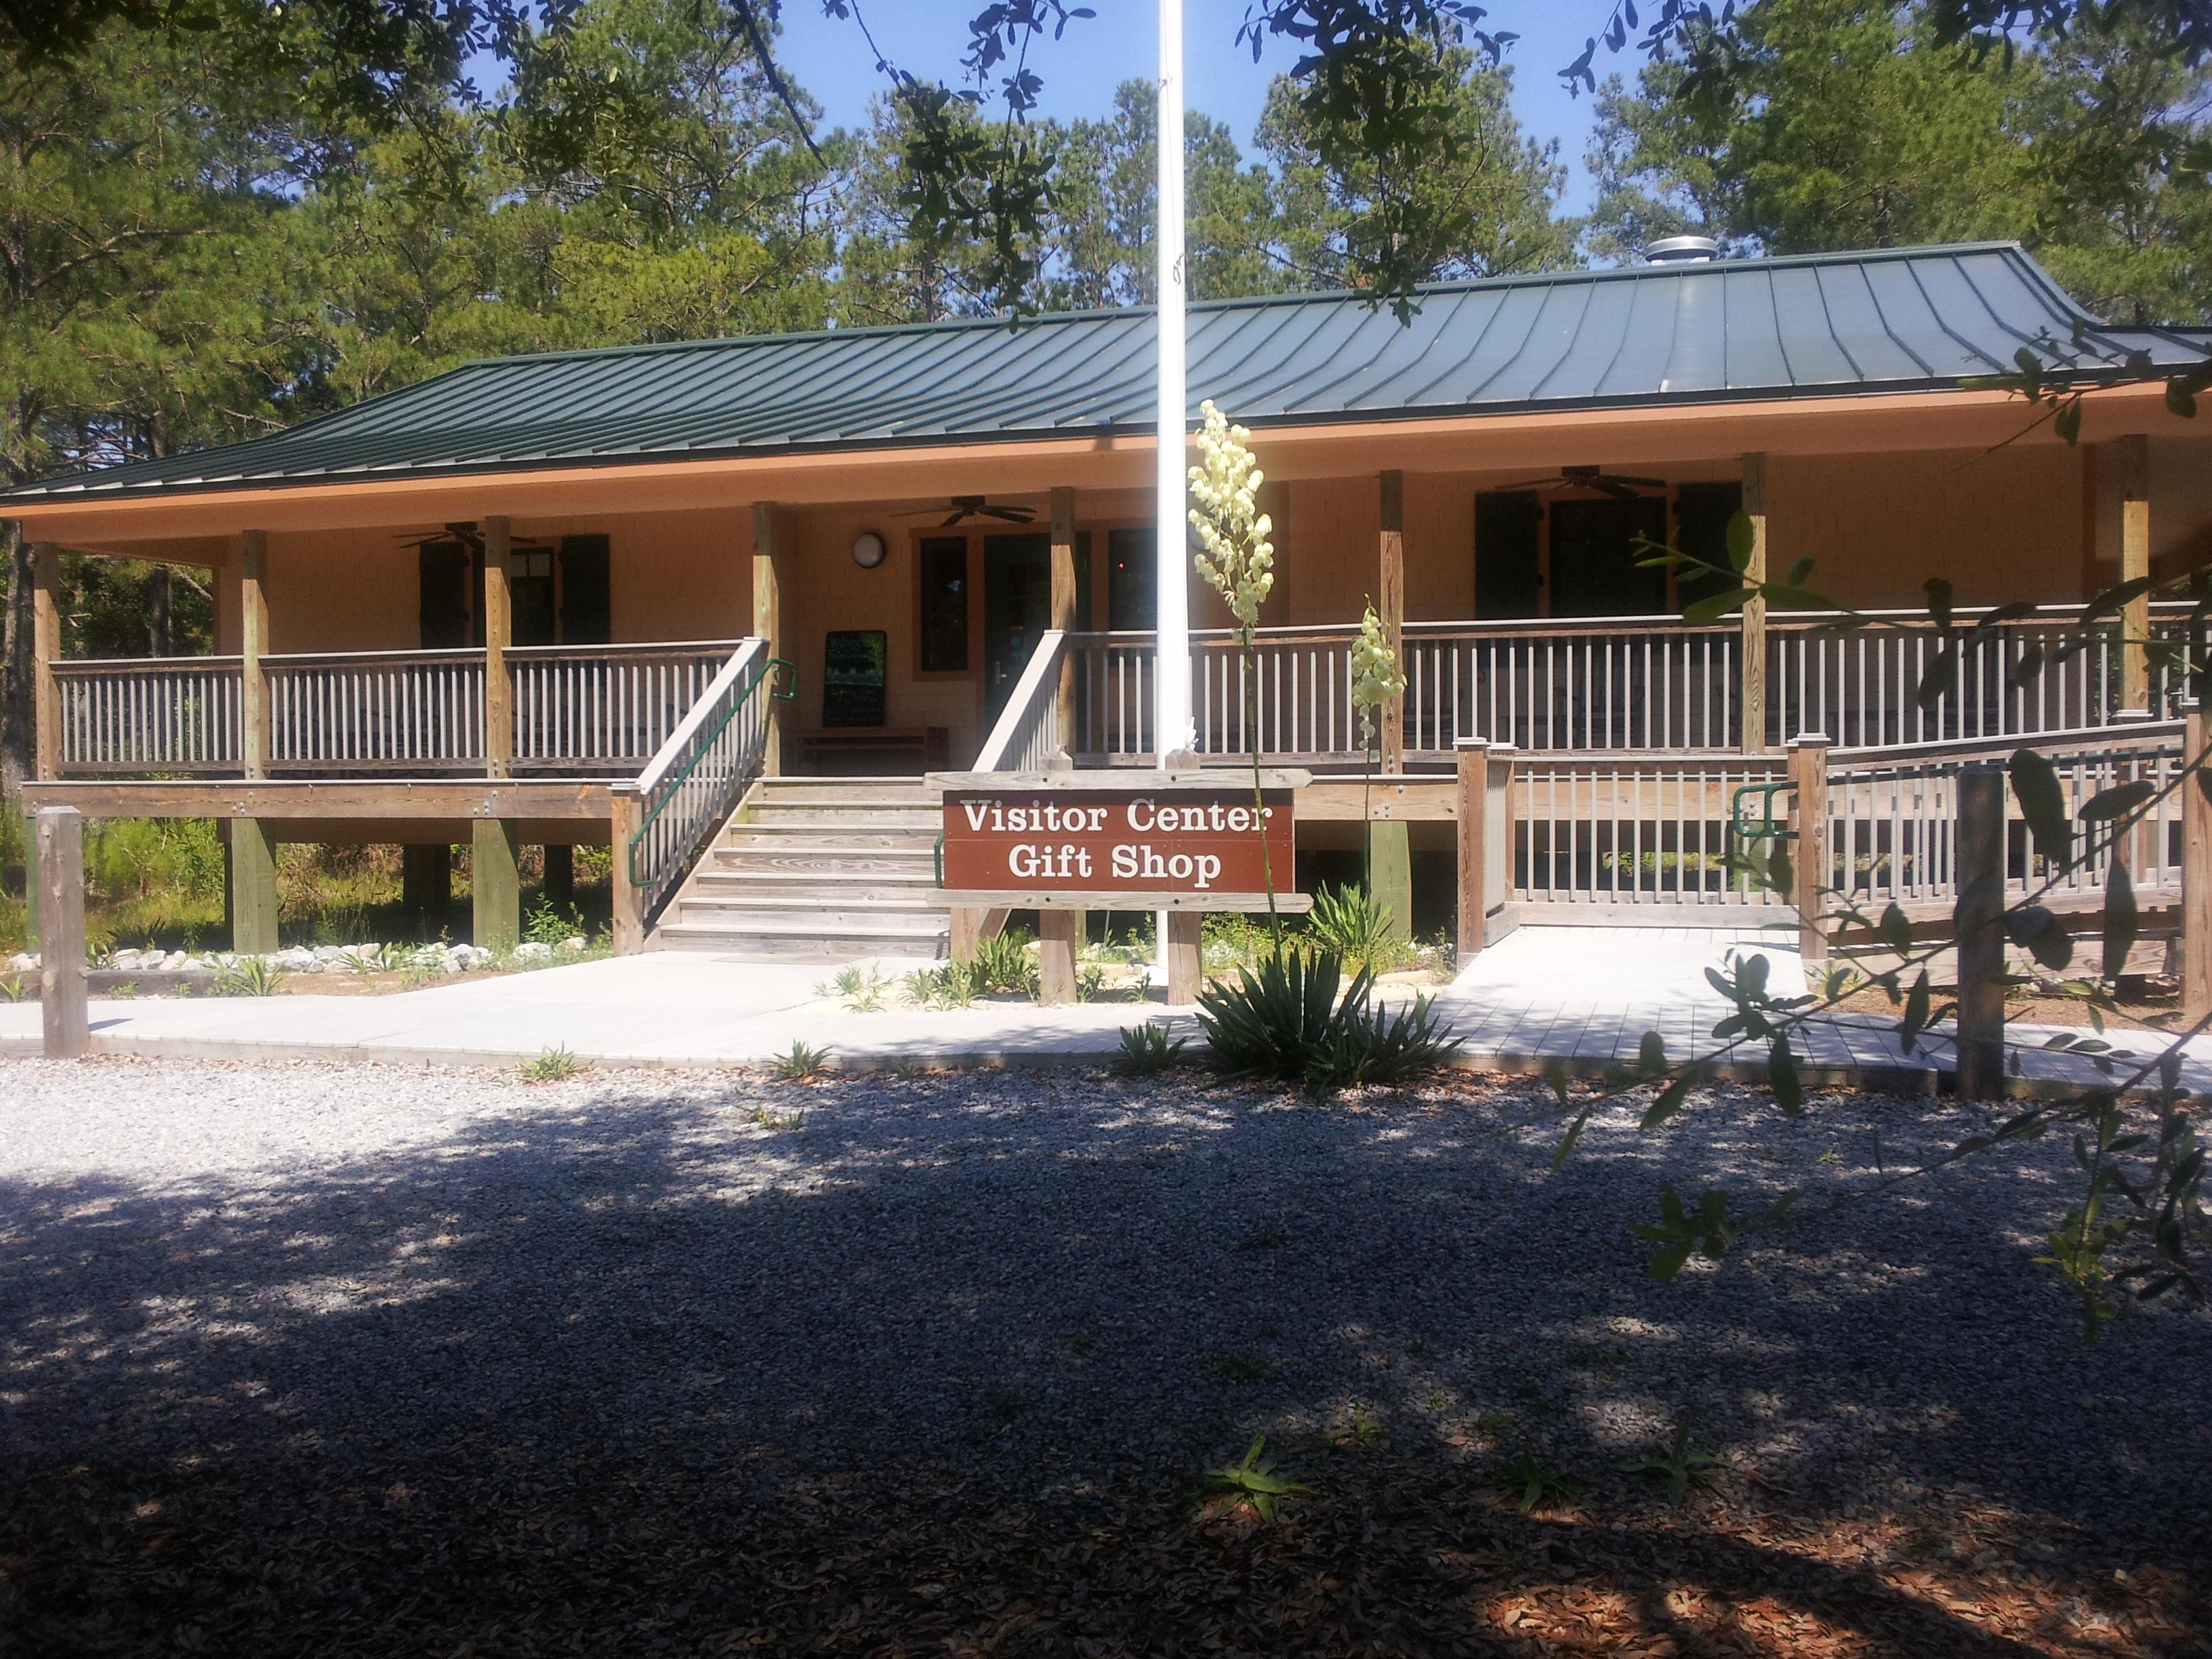 False Cape State Park Visitor Center